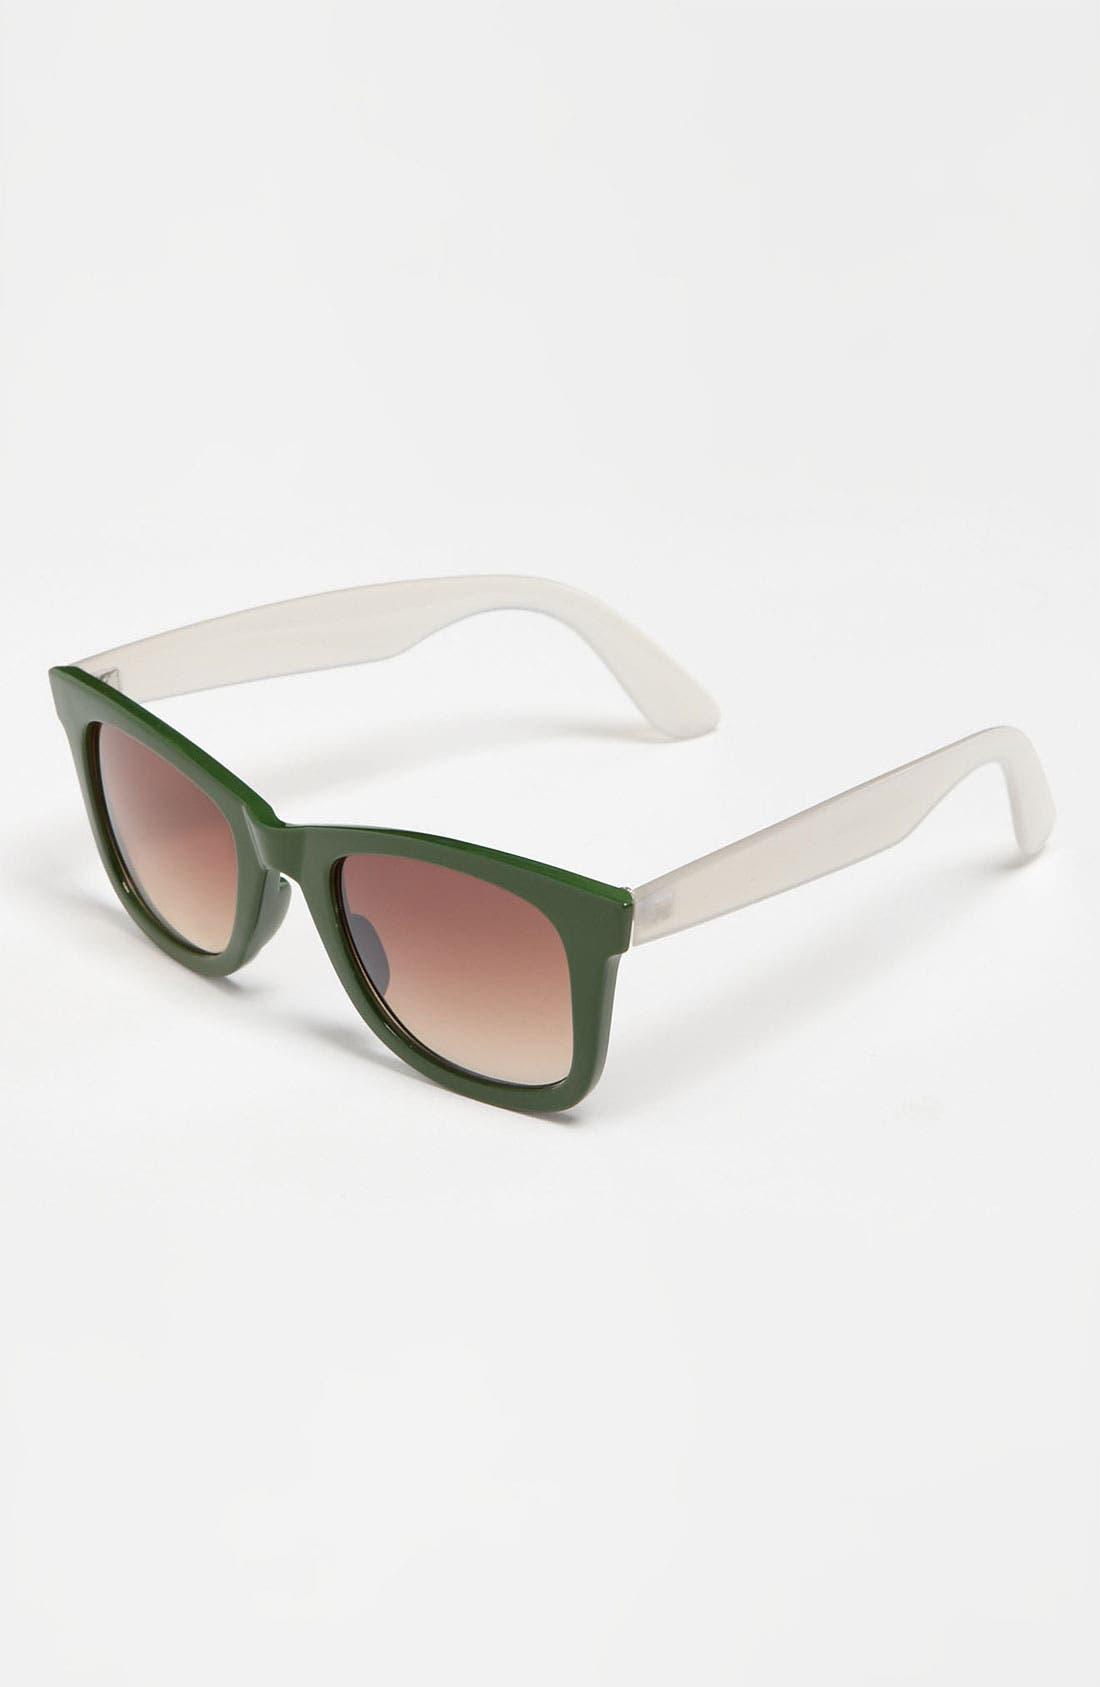 Main Image - Icon Eyewear 'Hank' Color Changing Sunglasses (Boys)